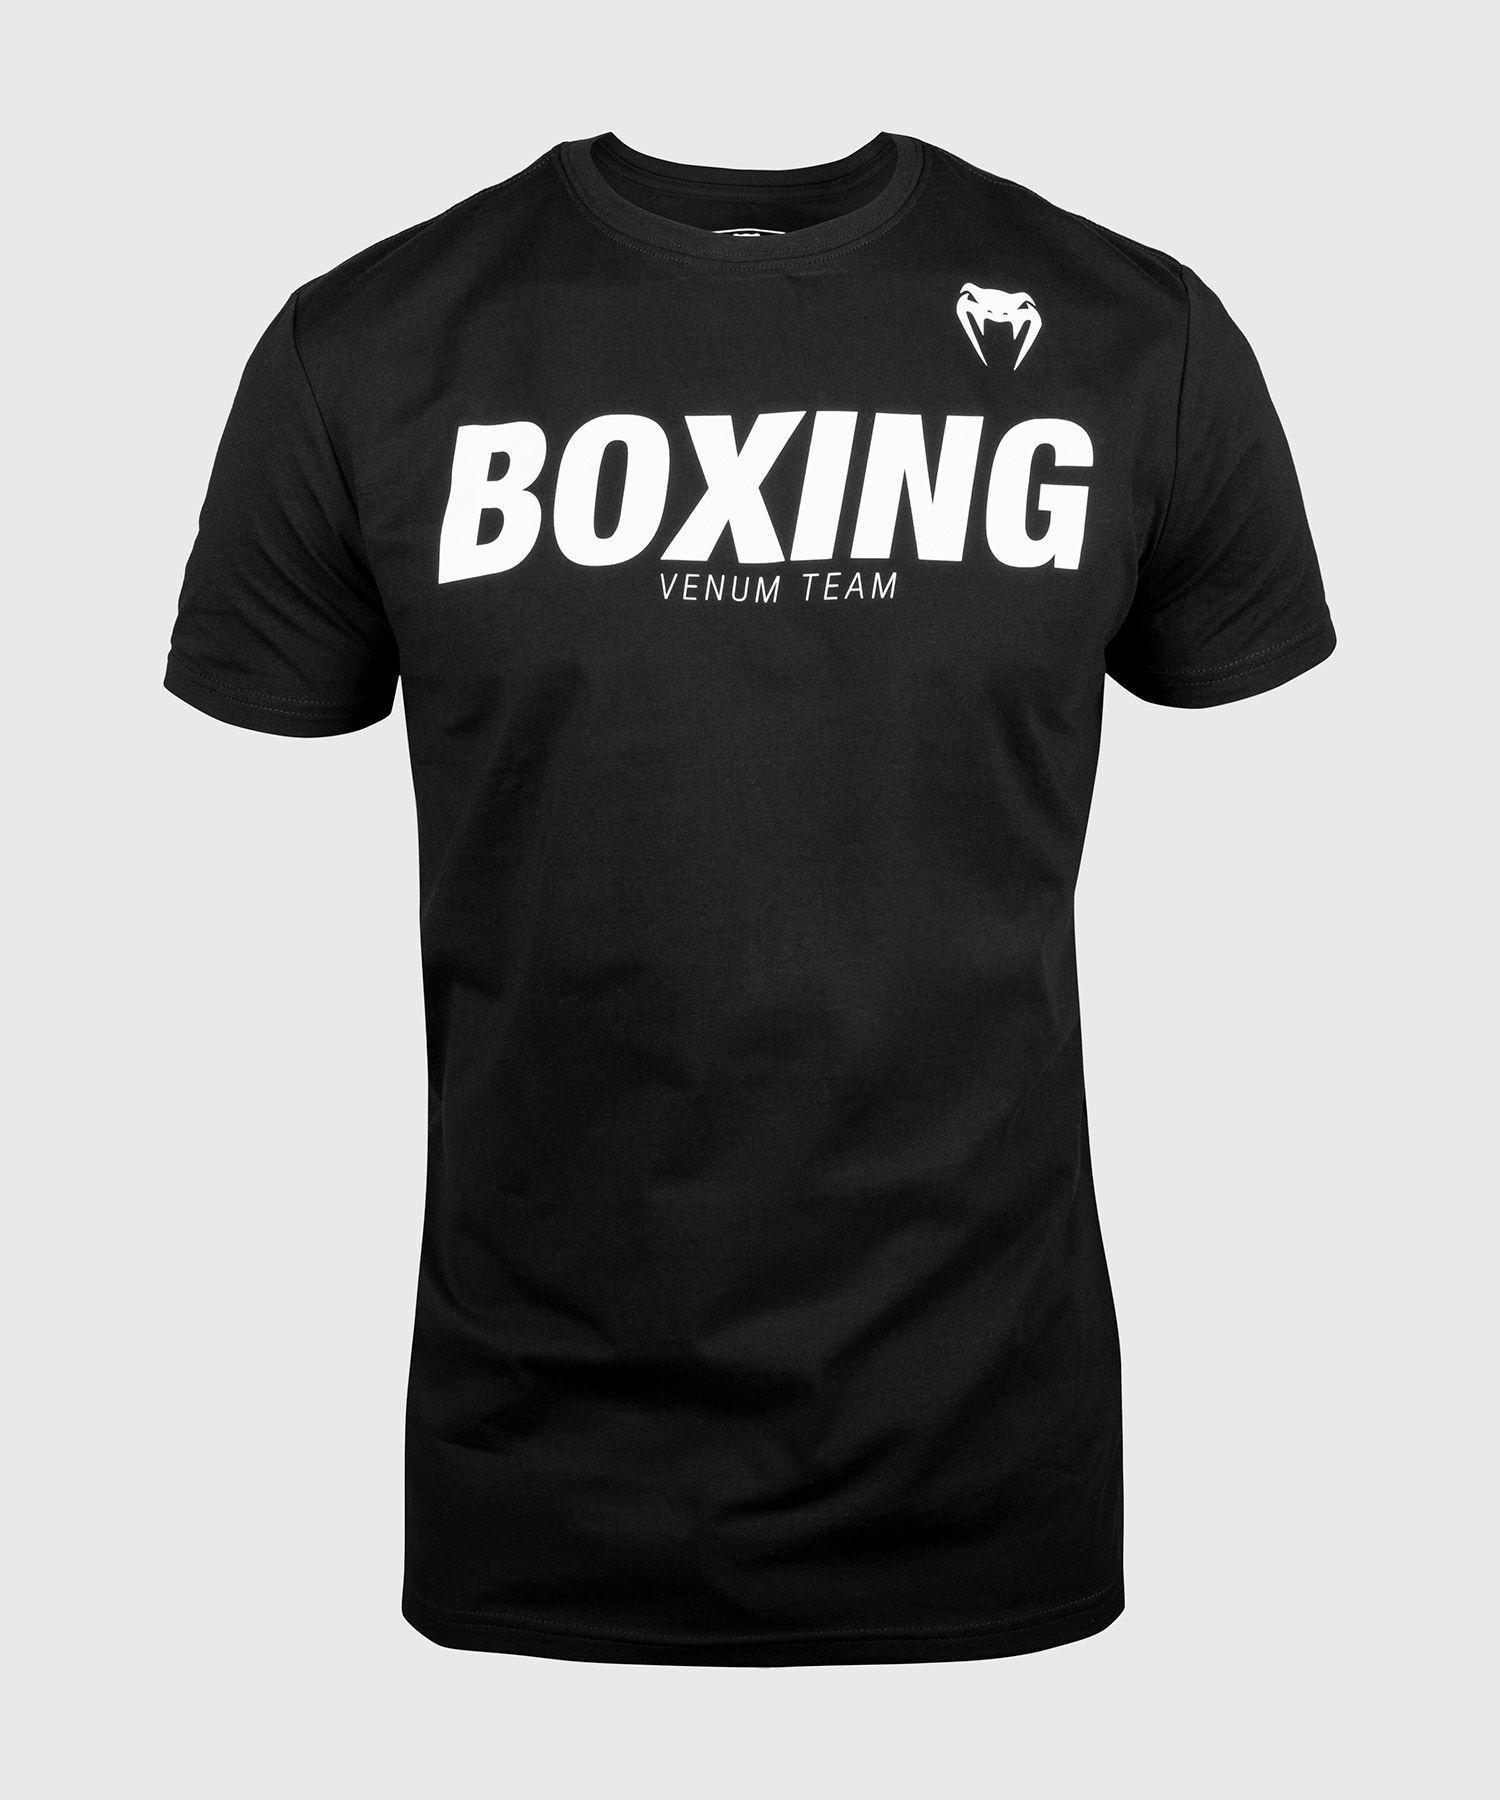 Venum Boxing VT T-shirt - Black/White